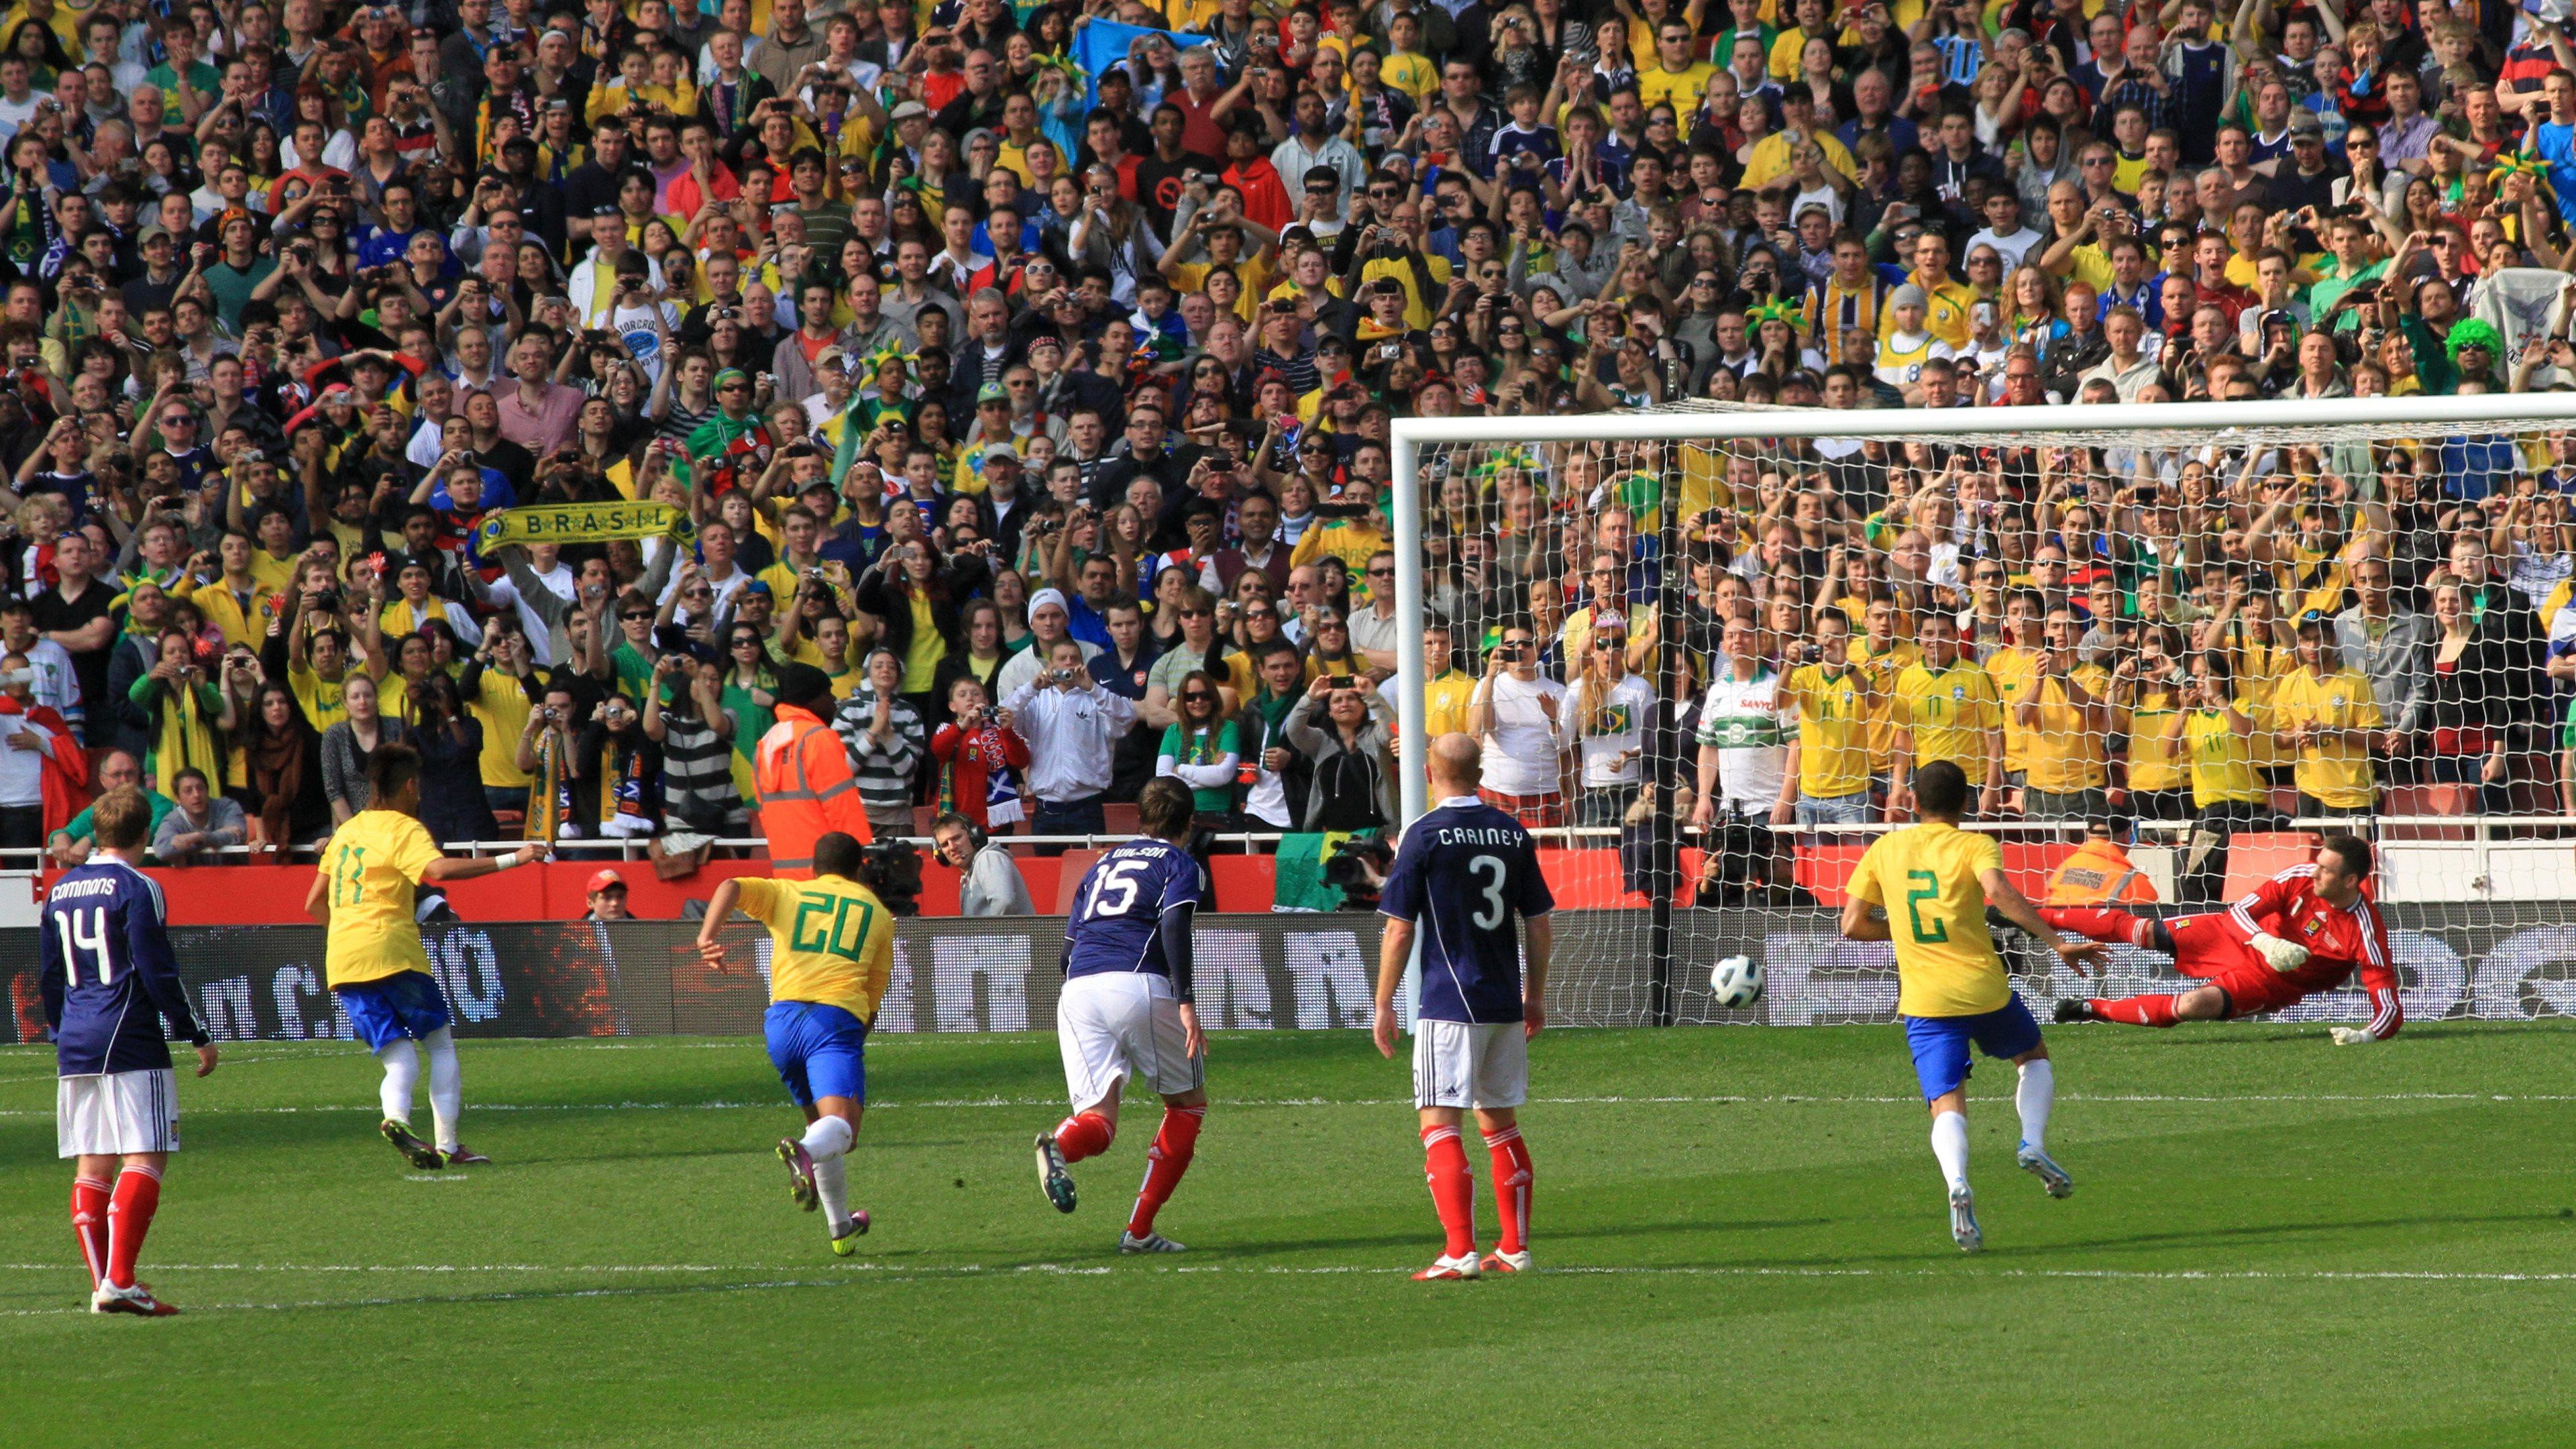 4k Ultra Hd Wallpaper Football: Wallpaper Football Goal